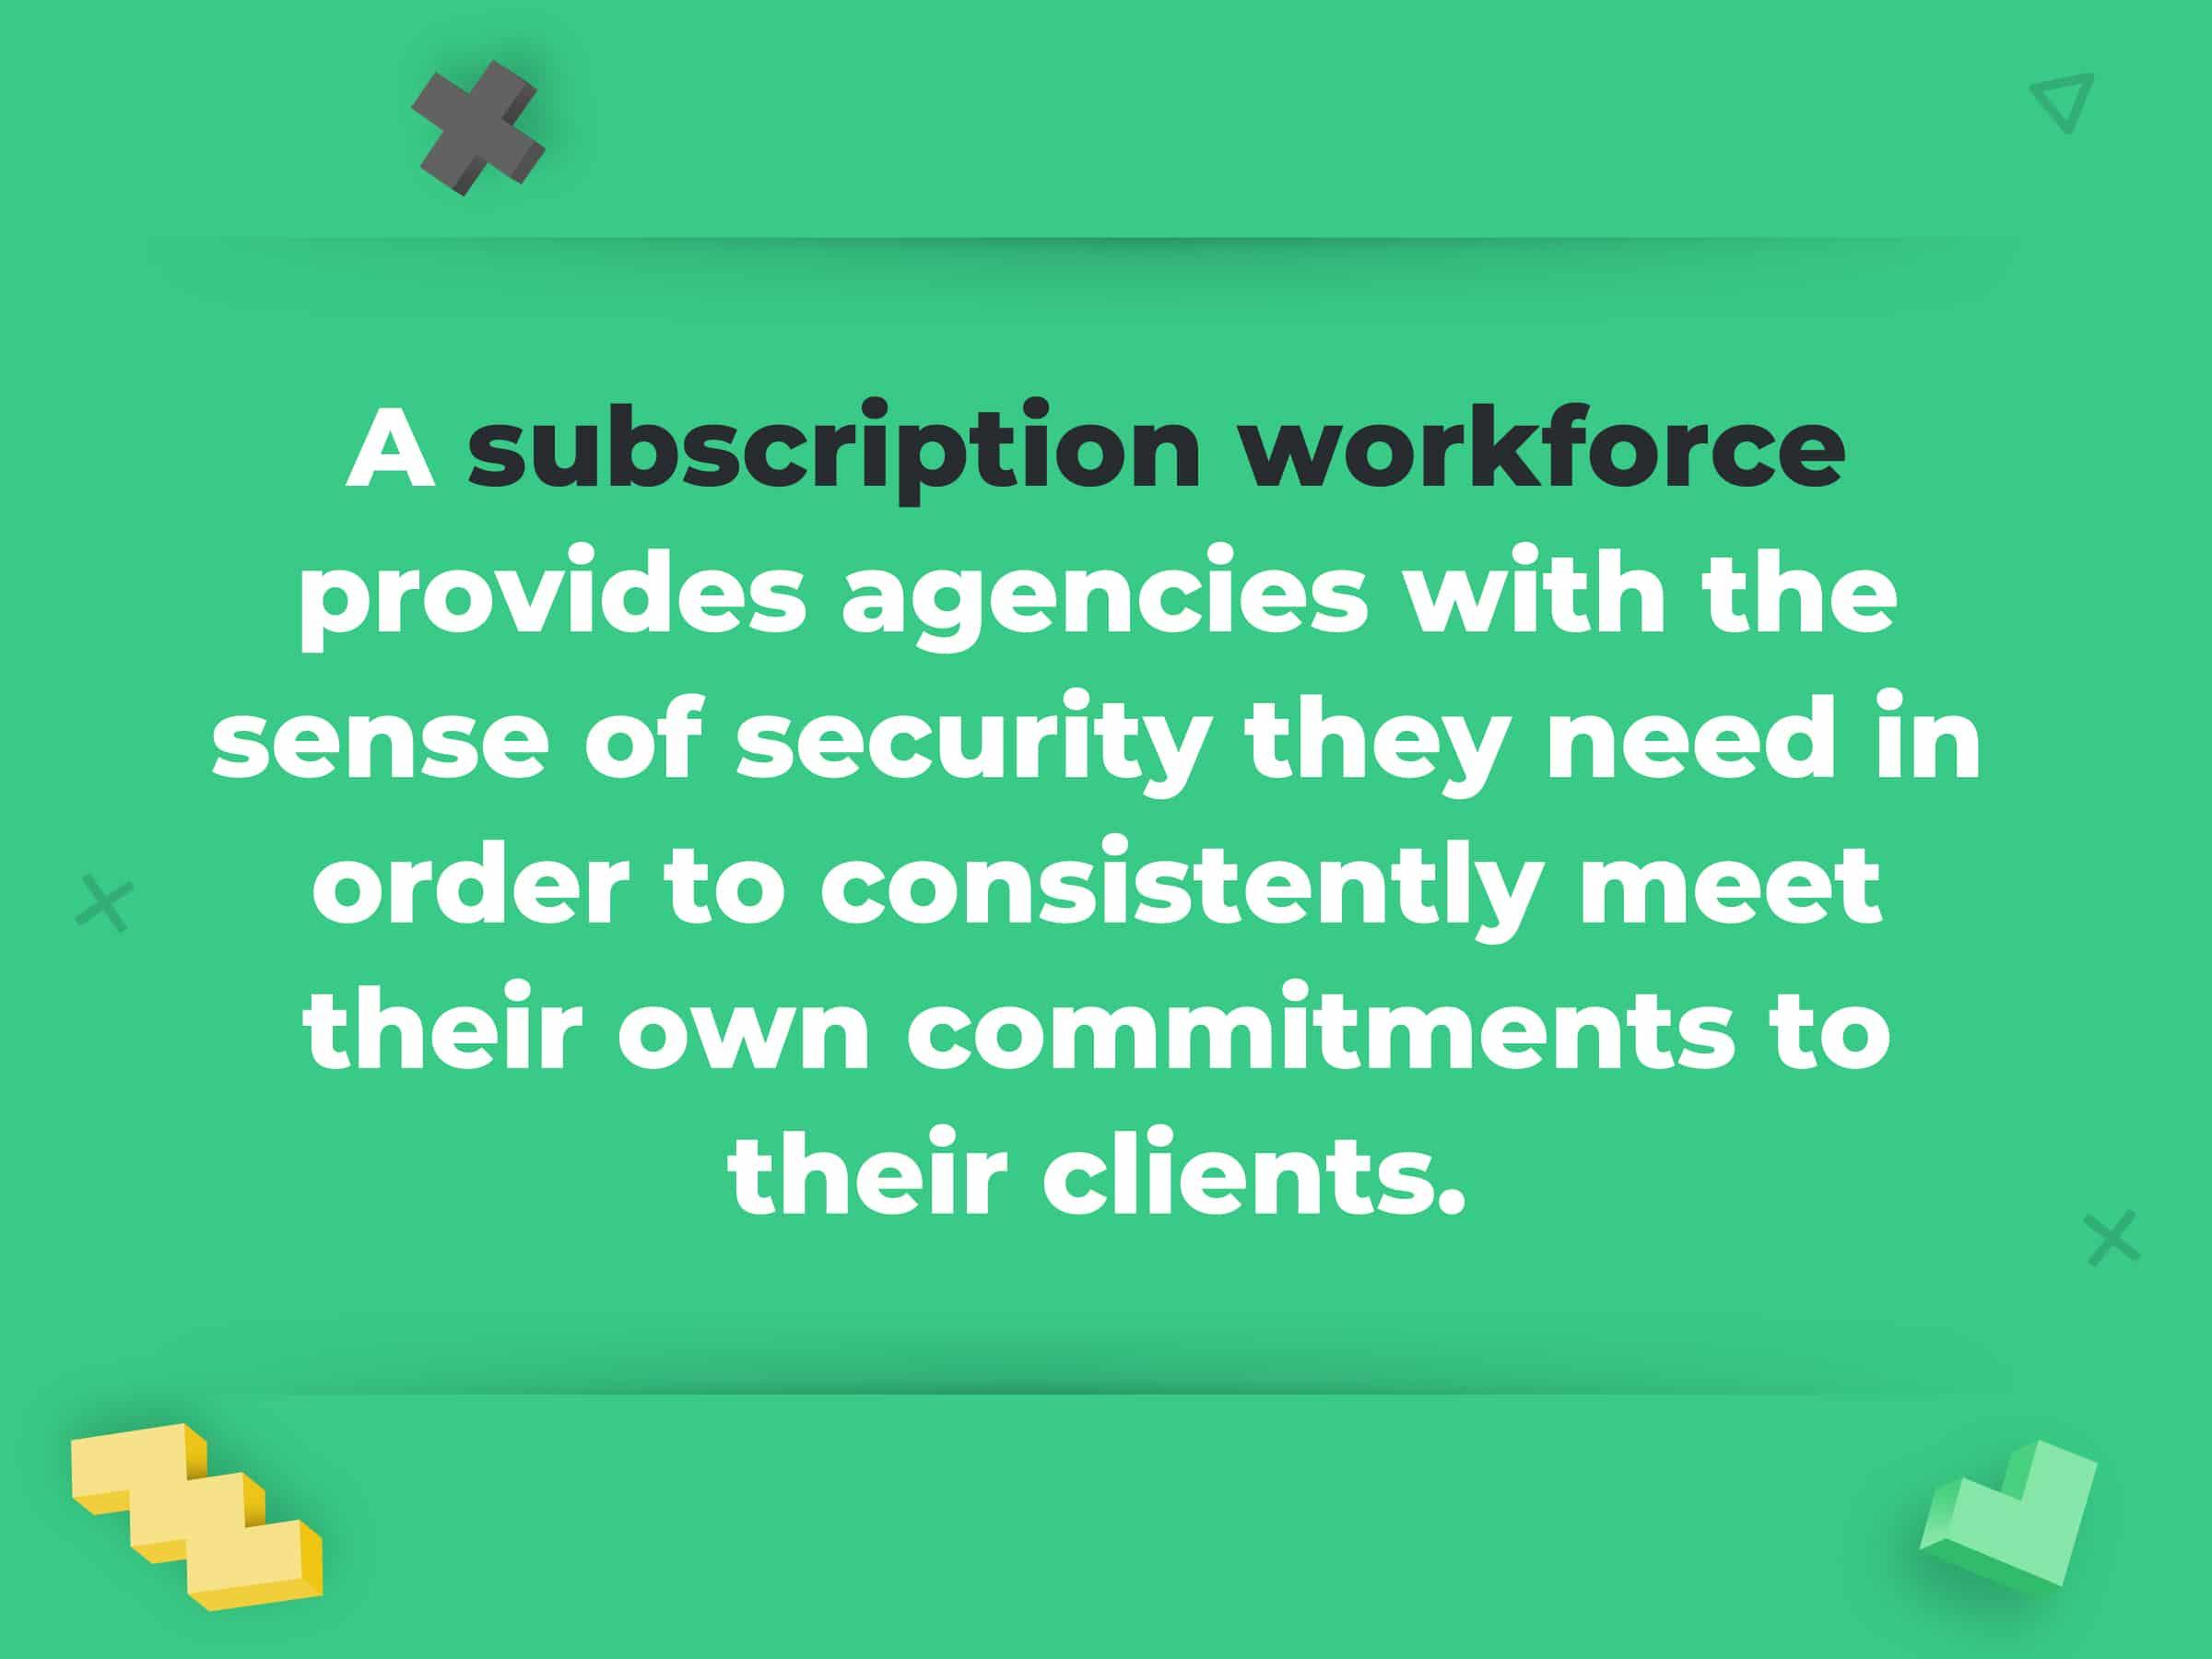 Design Pickle's Subscription Workforce